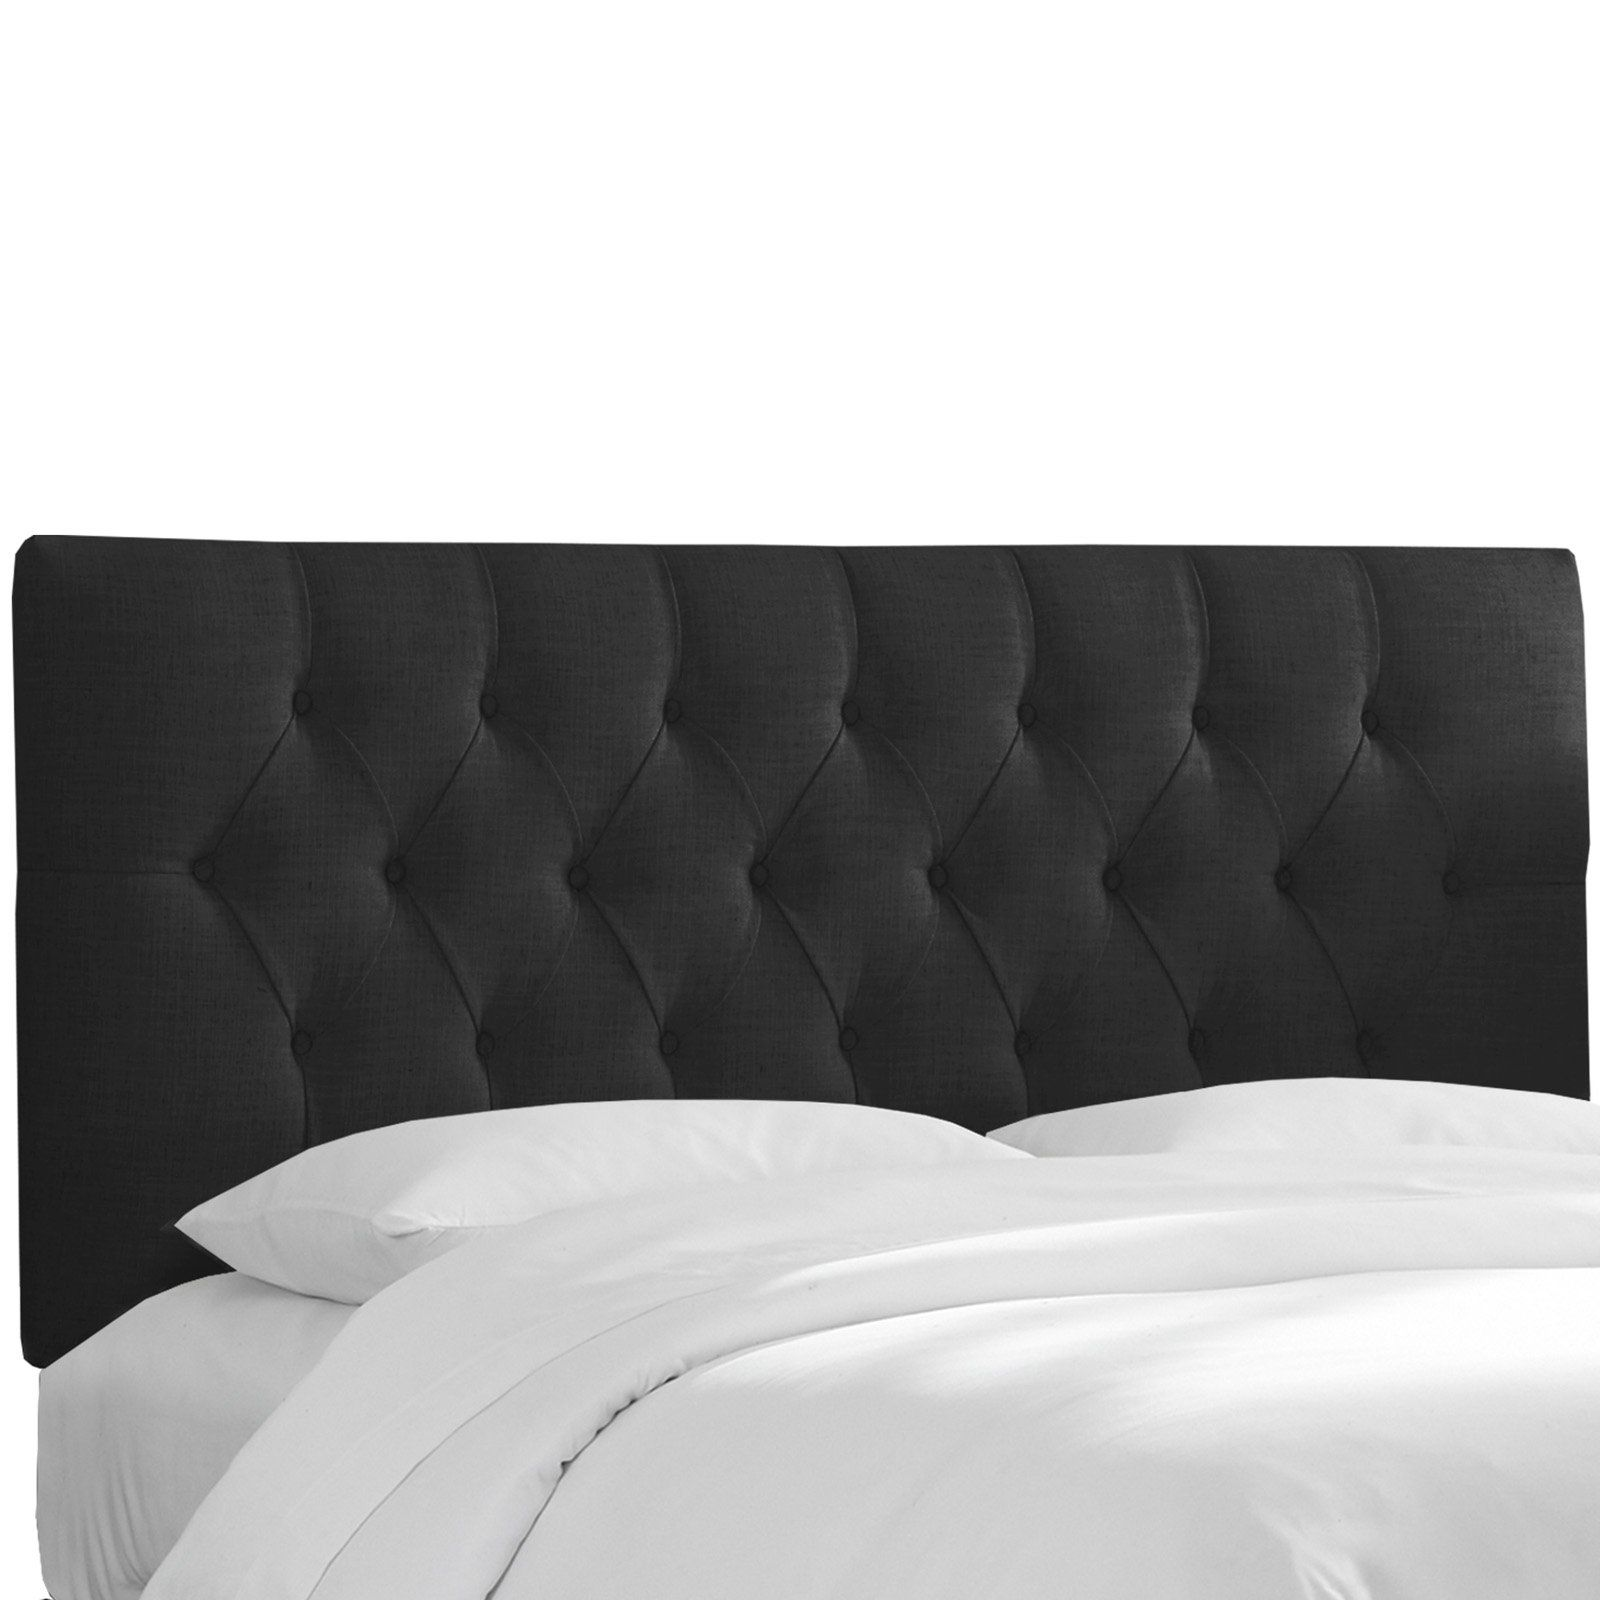 Skyline Tufted Linen Upholstered Headboard Black Size Twin